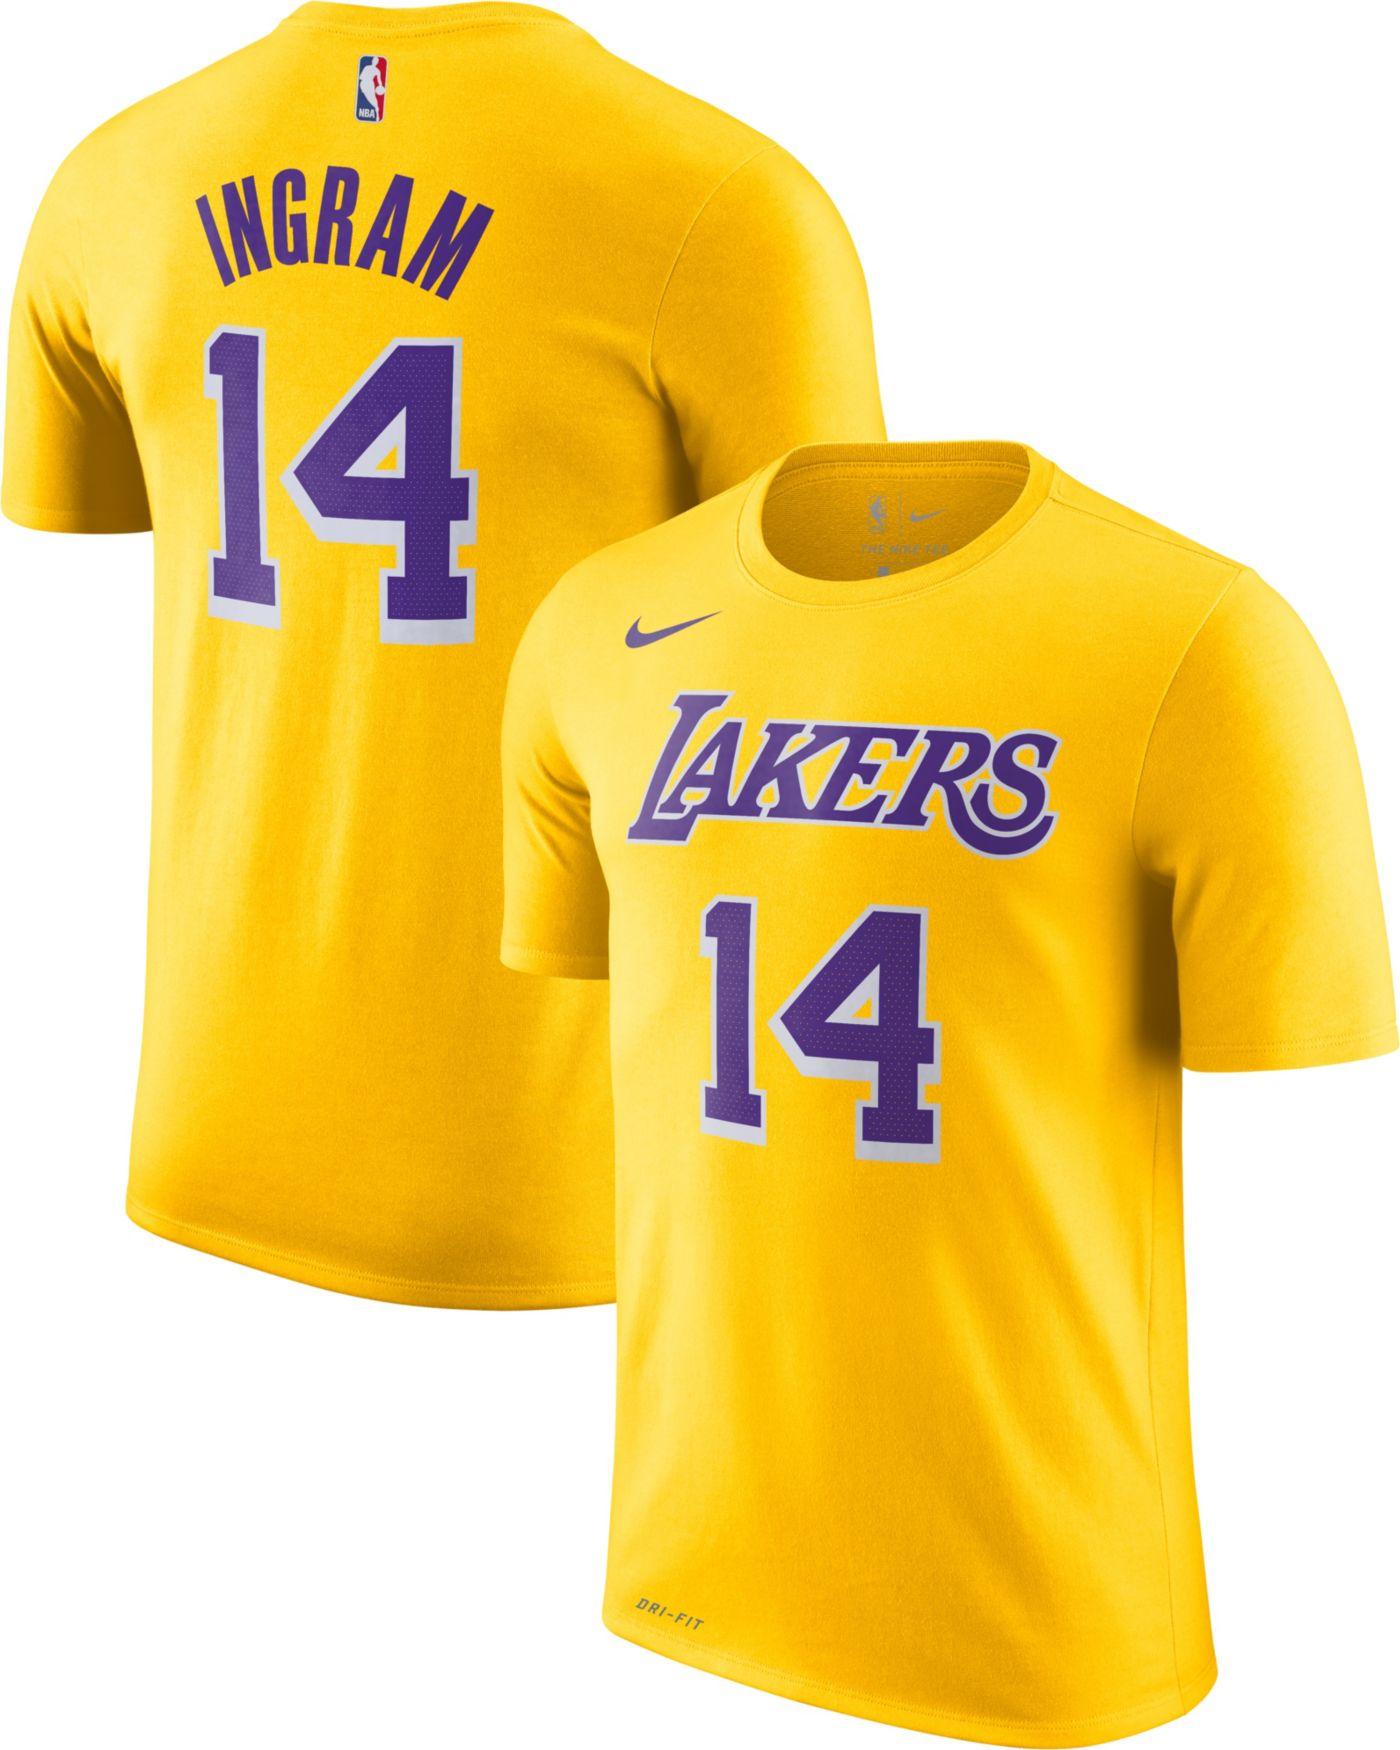 Nike Youth Los Angeles Lakers Brandon Ingram #14 Dri-FIT Gold T-Shirt